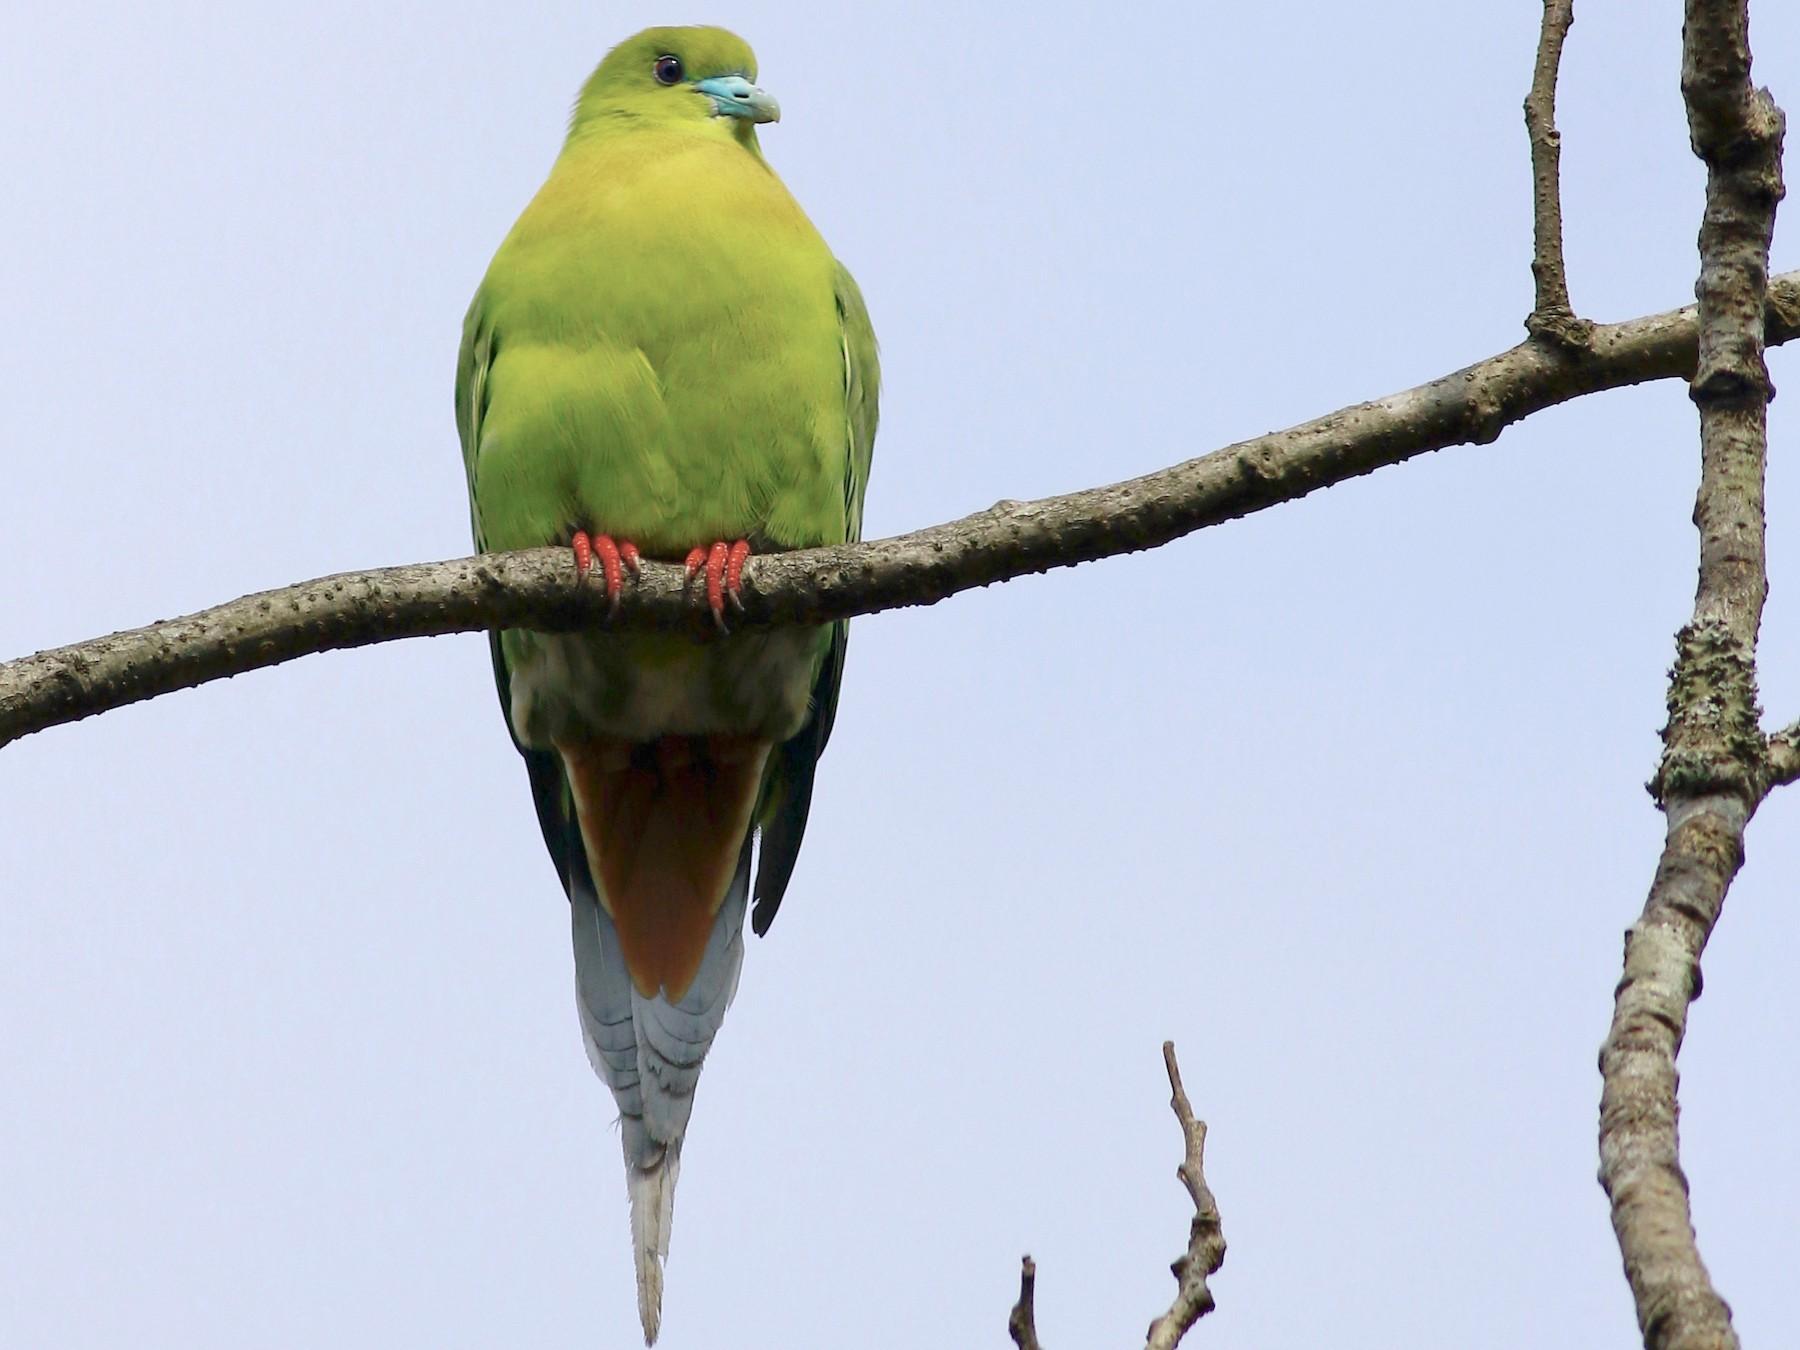 Pin-tailed Green-Pigeon - Sudhir Herle